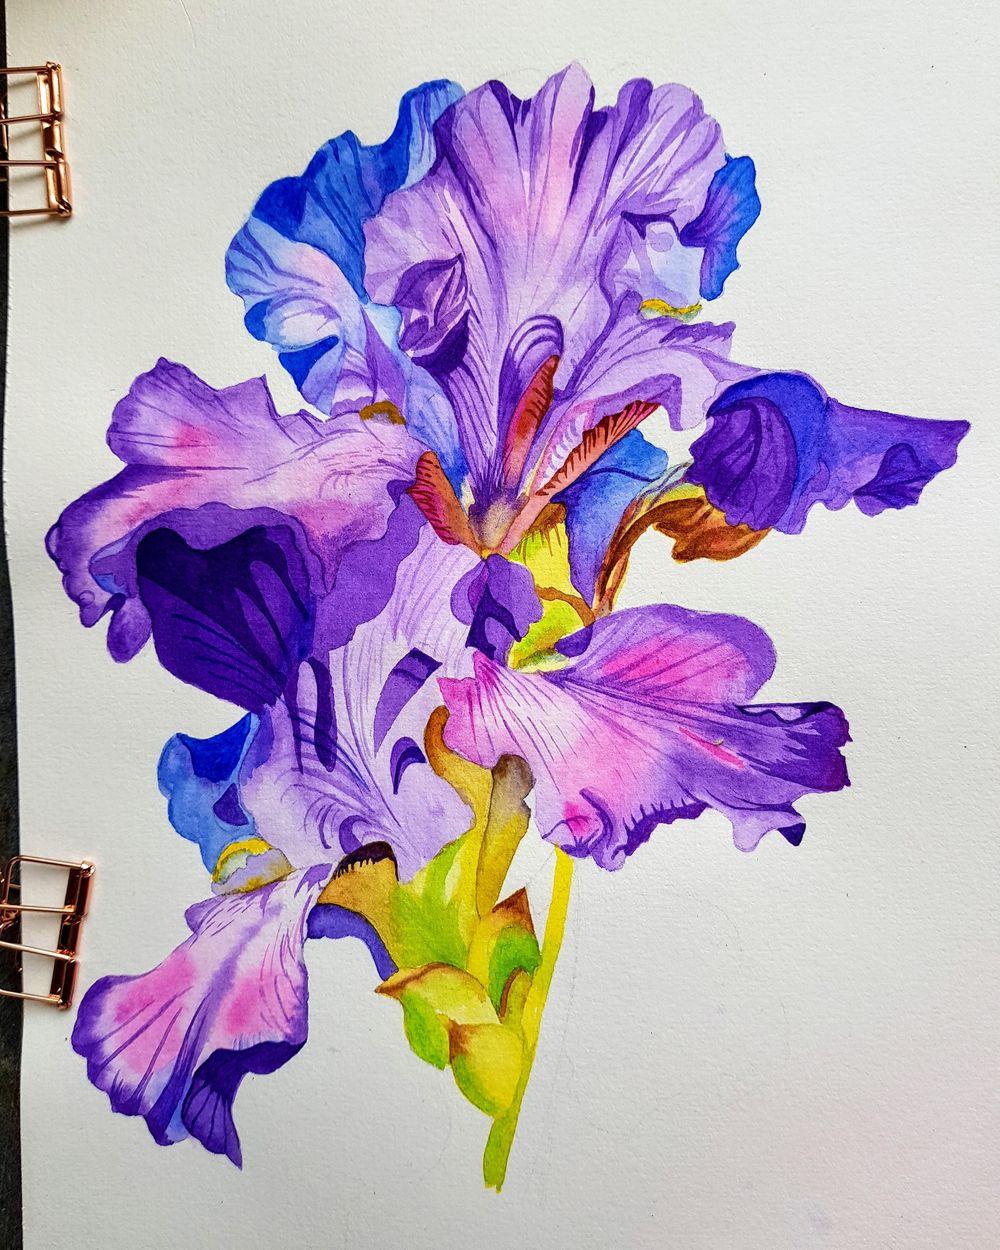 Iris flower - image 1 - student project